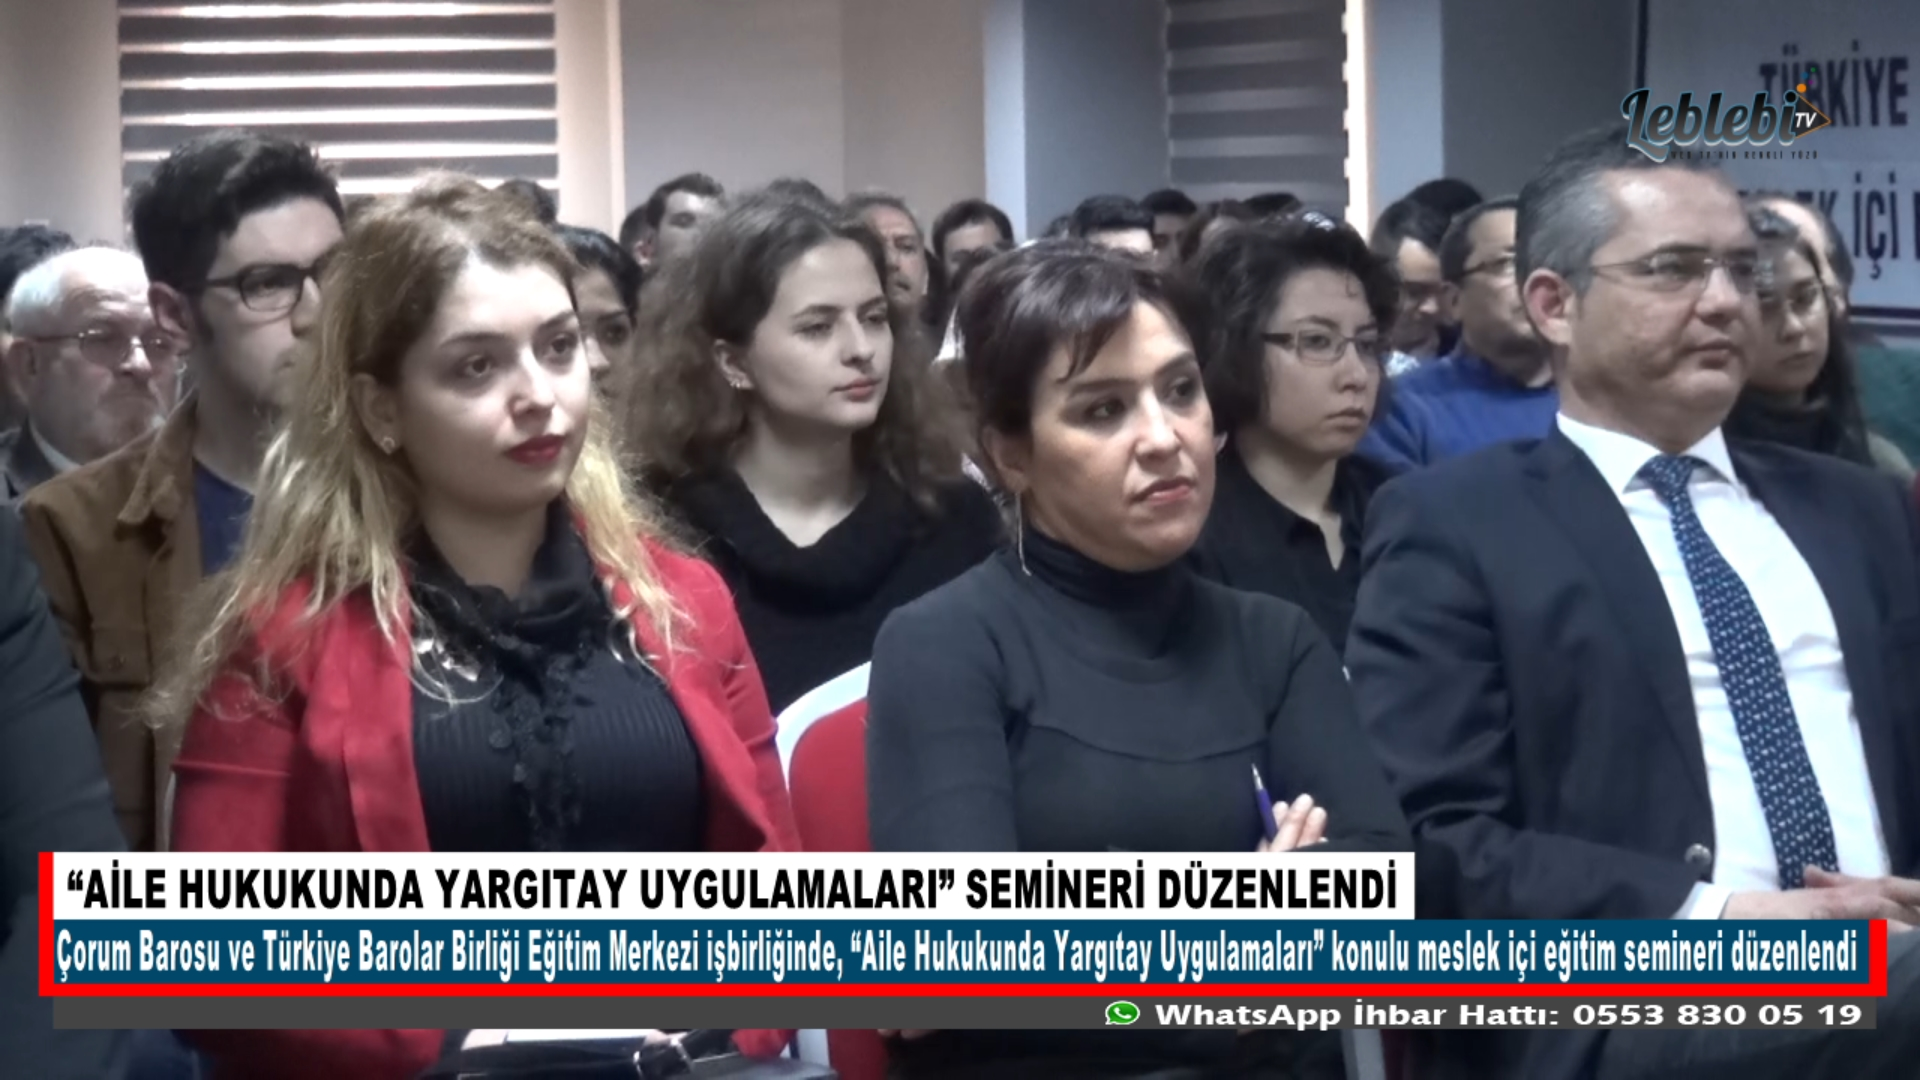 """AİLE HUKUKUNDA YARGITAY UYGULAMALARI"" SEMİNERİ DÜZENLENDİ"